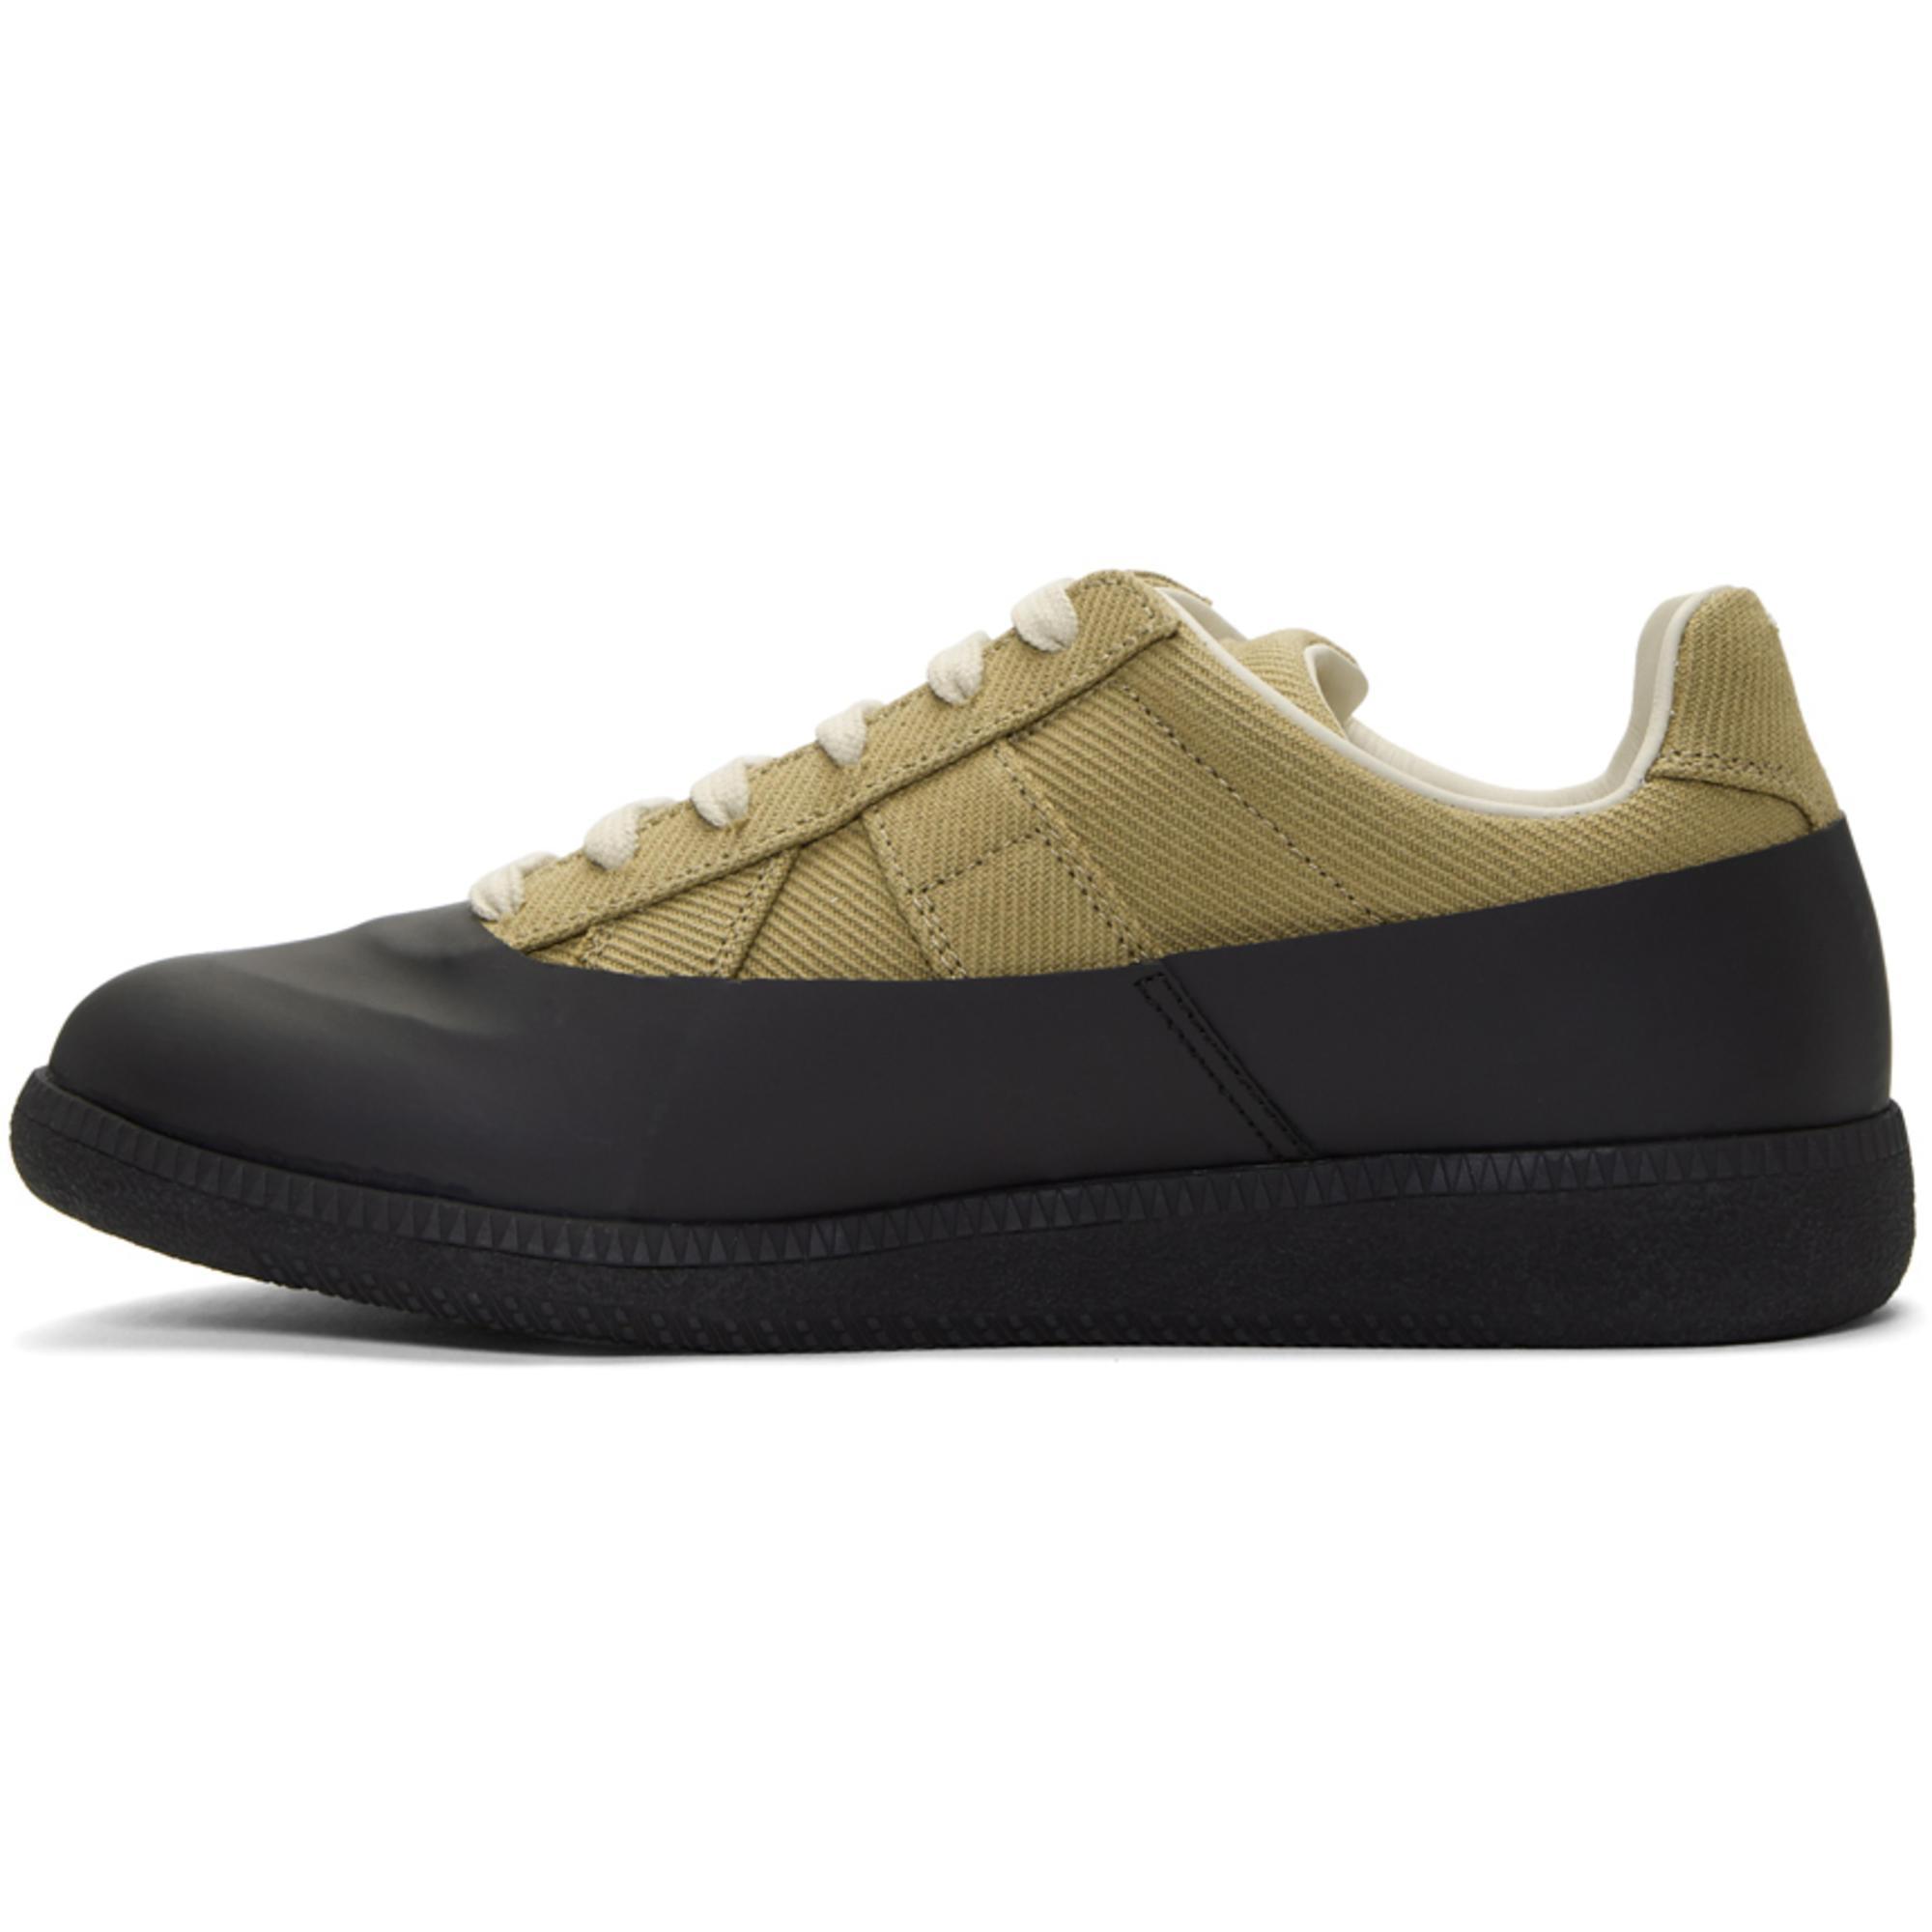 Black Galosh Replica Sneakers Maison Martin Margiela SOwOMUYtM